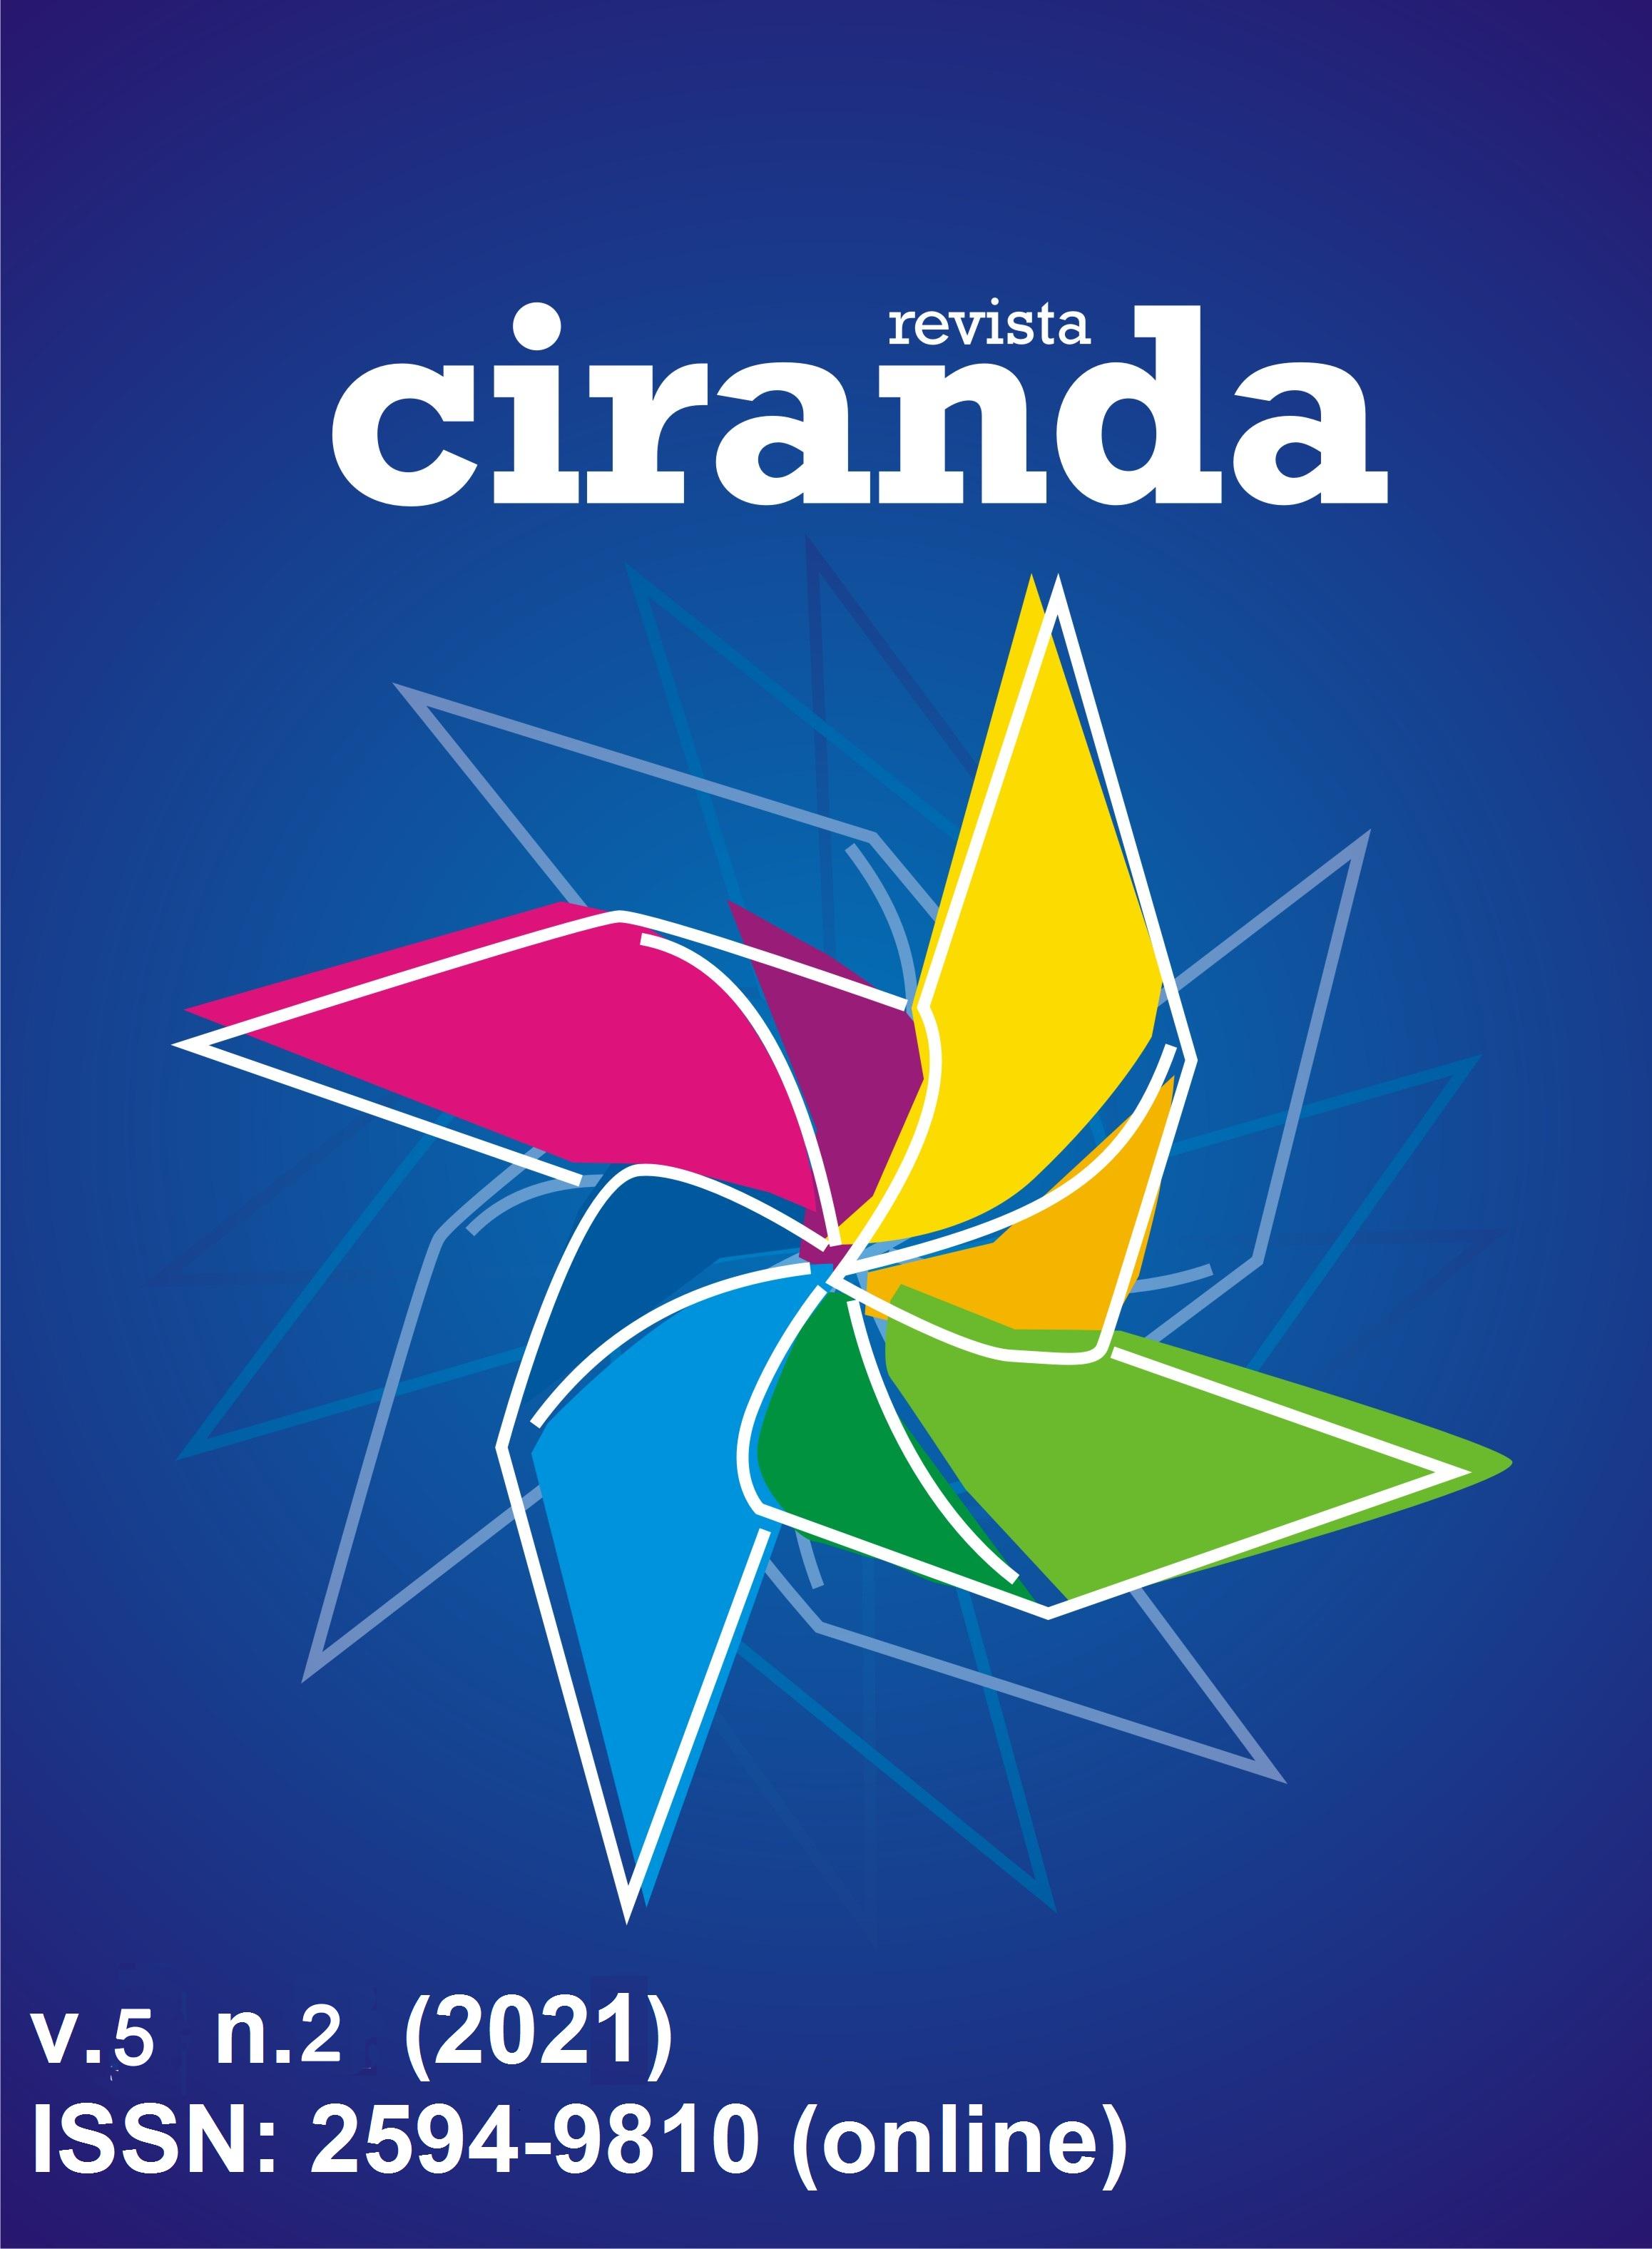 Visualizar v. 5 n. 2 (2021): REVISTA CIRANDA